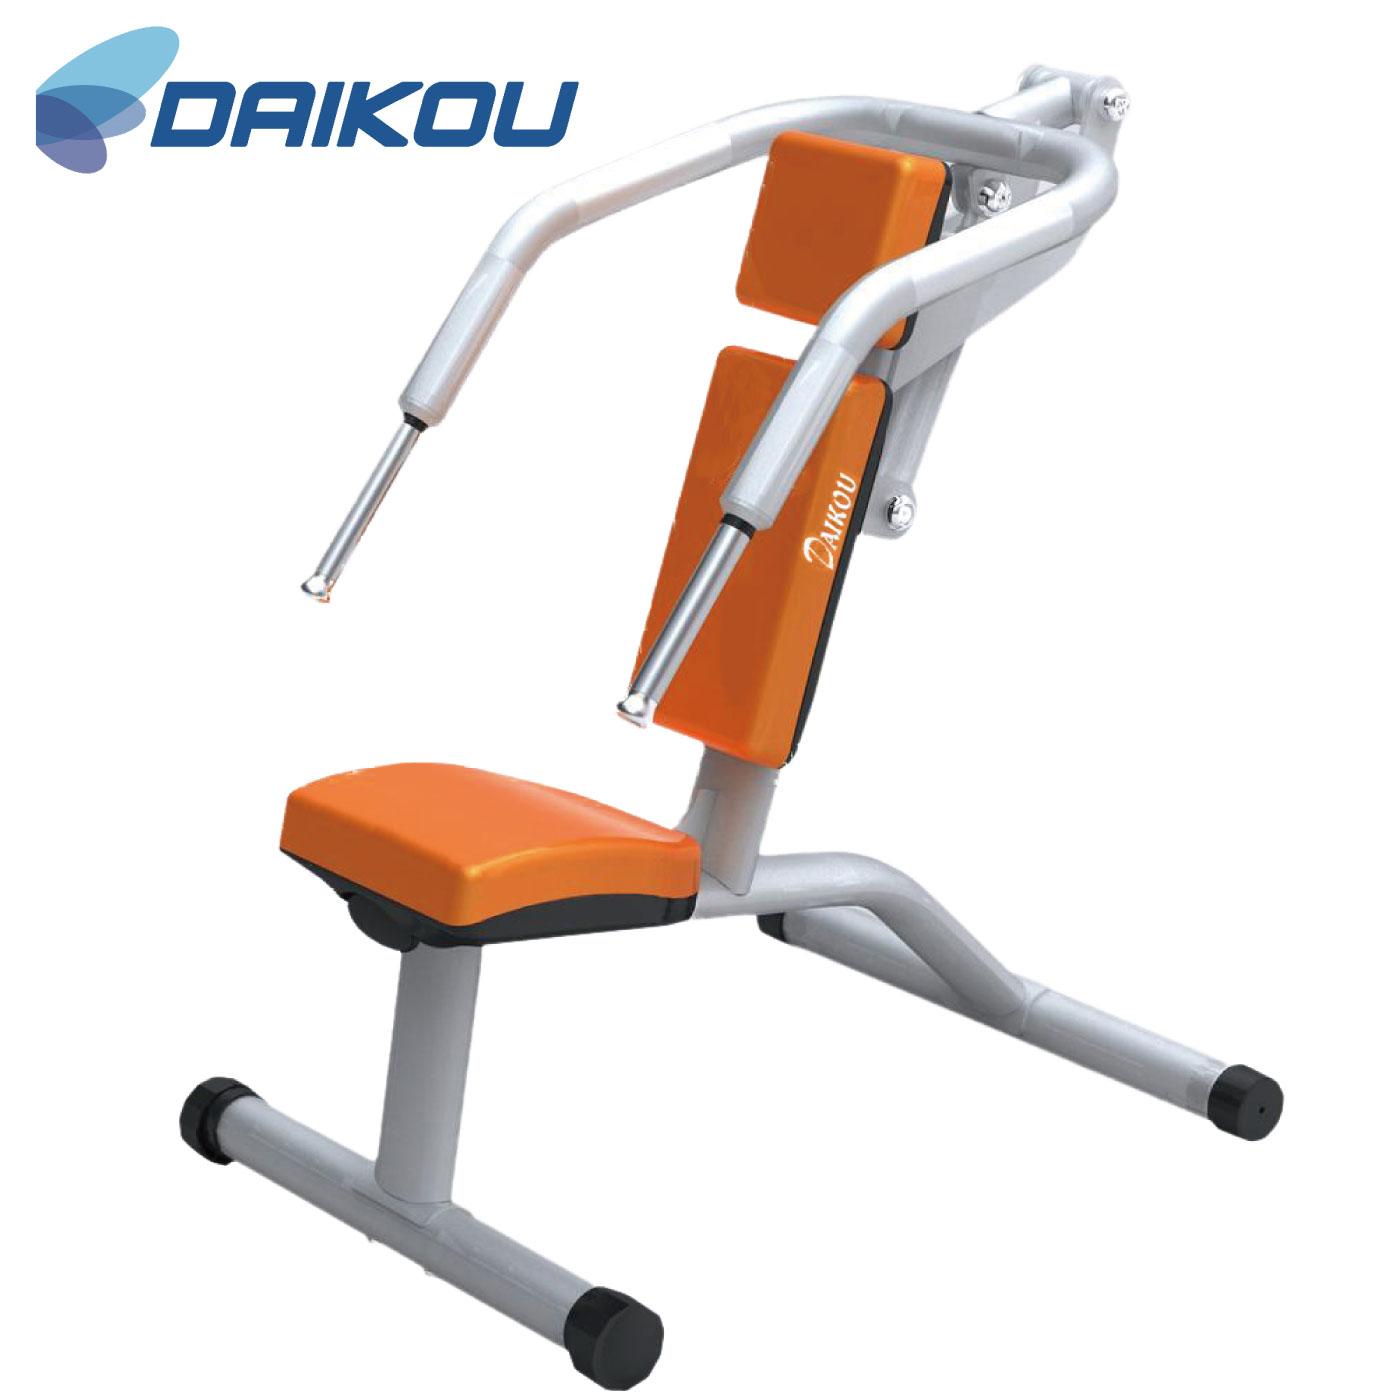 DK-1202(ショルダープレス・プルダウン)/準業務用油圧マシン《DAIKOU(ダイコー)》